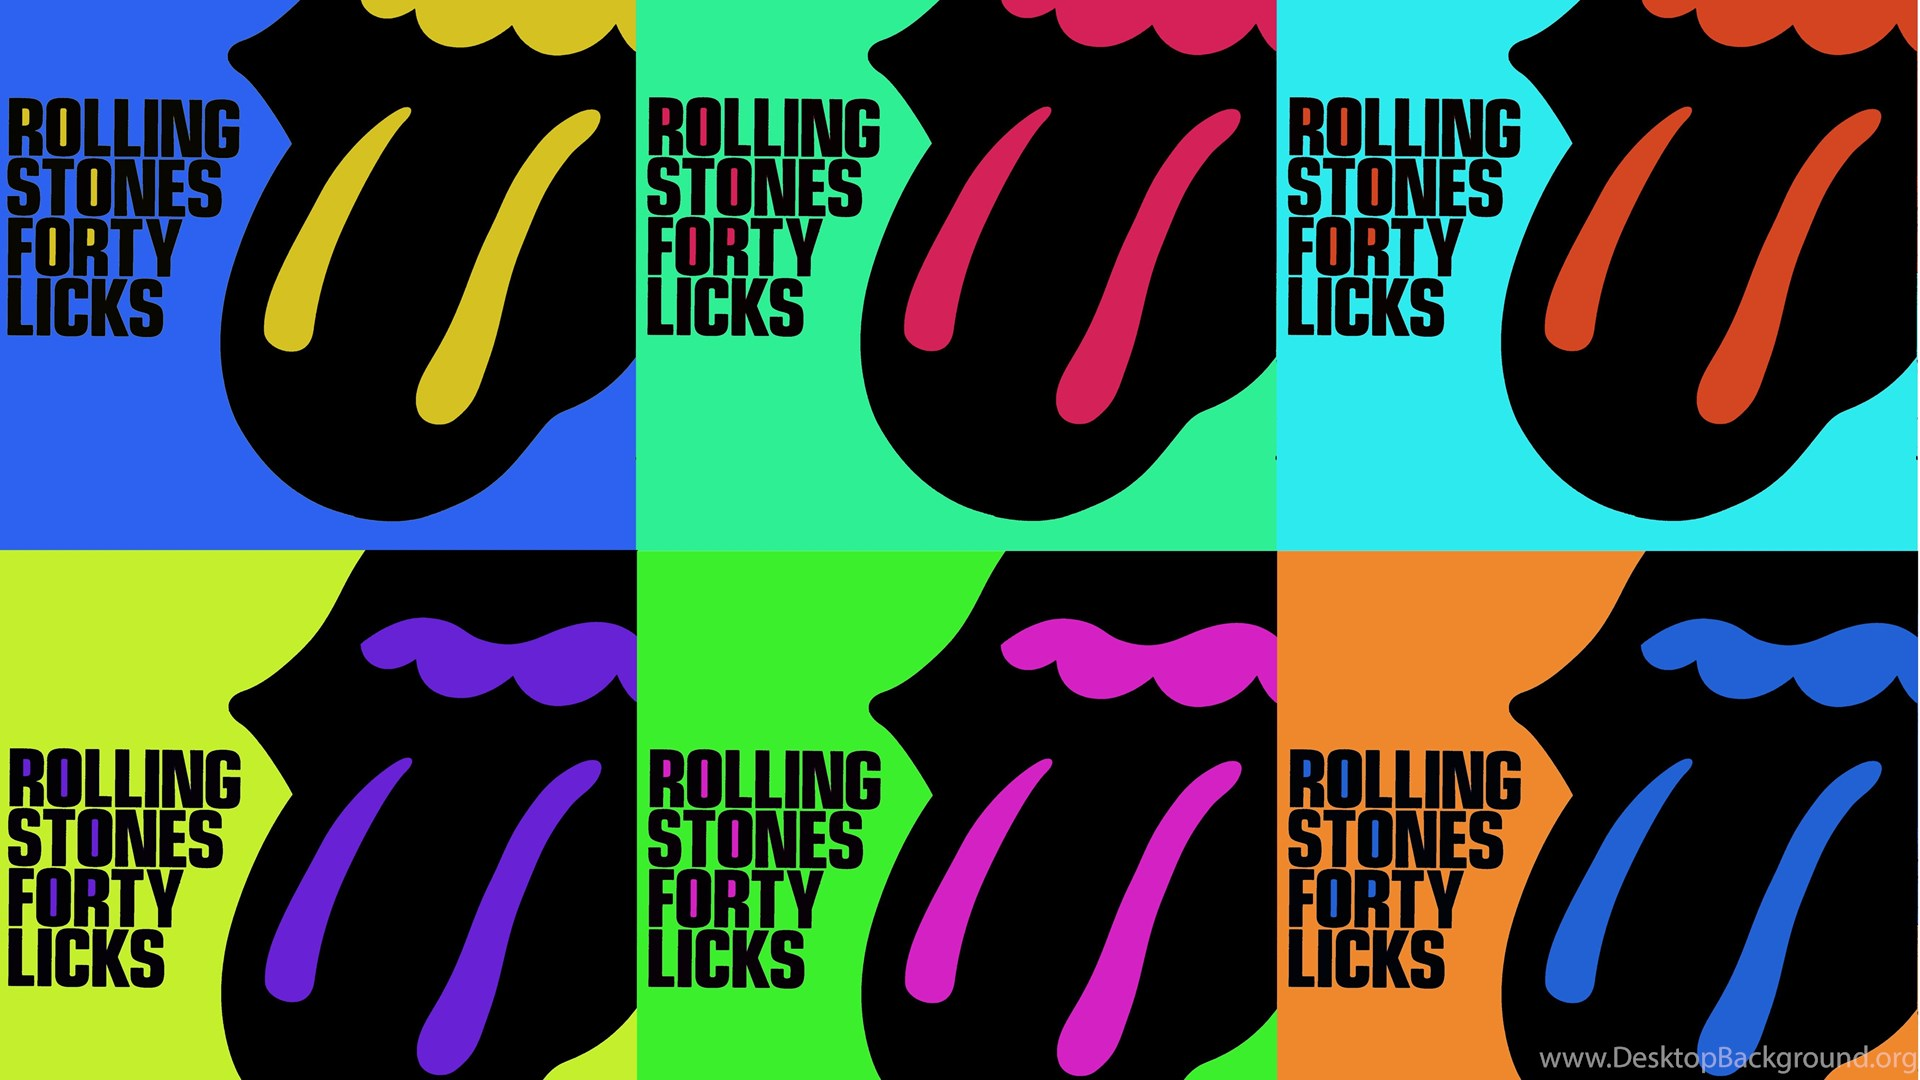 Wallpapers Sobre Rolling Stones HD 15 Megapixeles Taringa Desktop